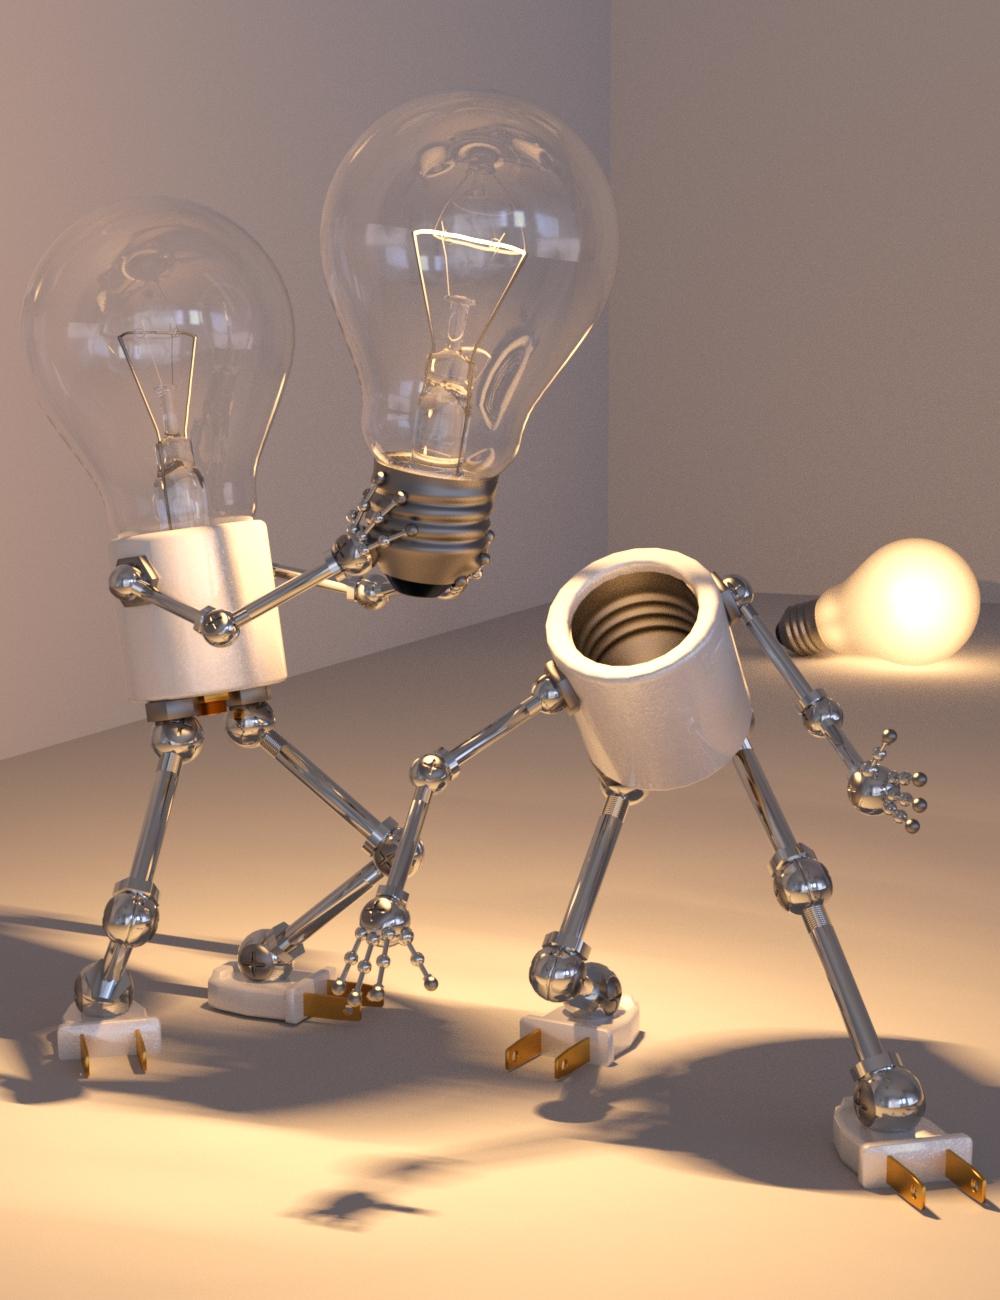 Light Bob by: DzFire, 3D Models by Daz 3D